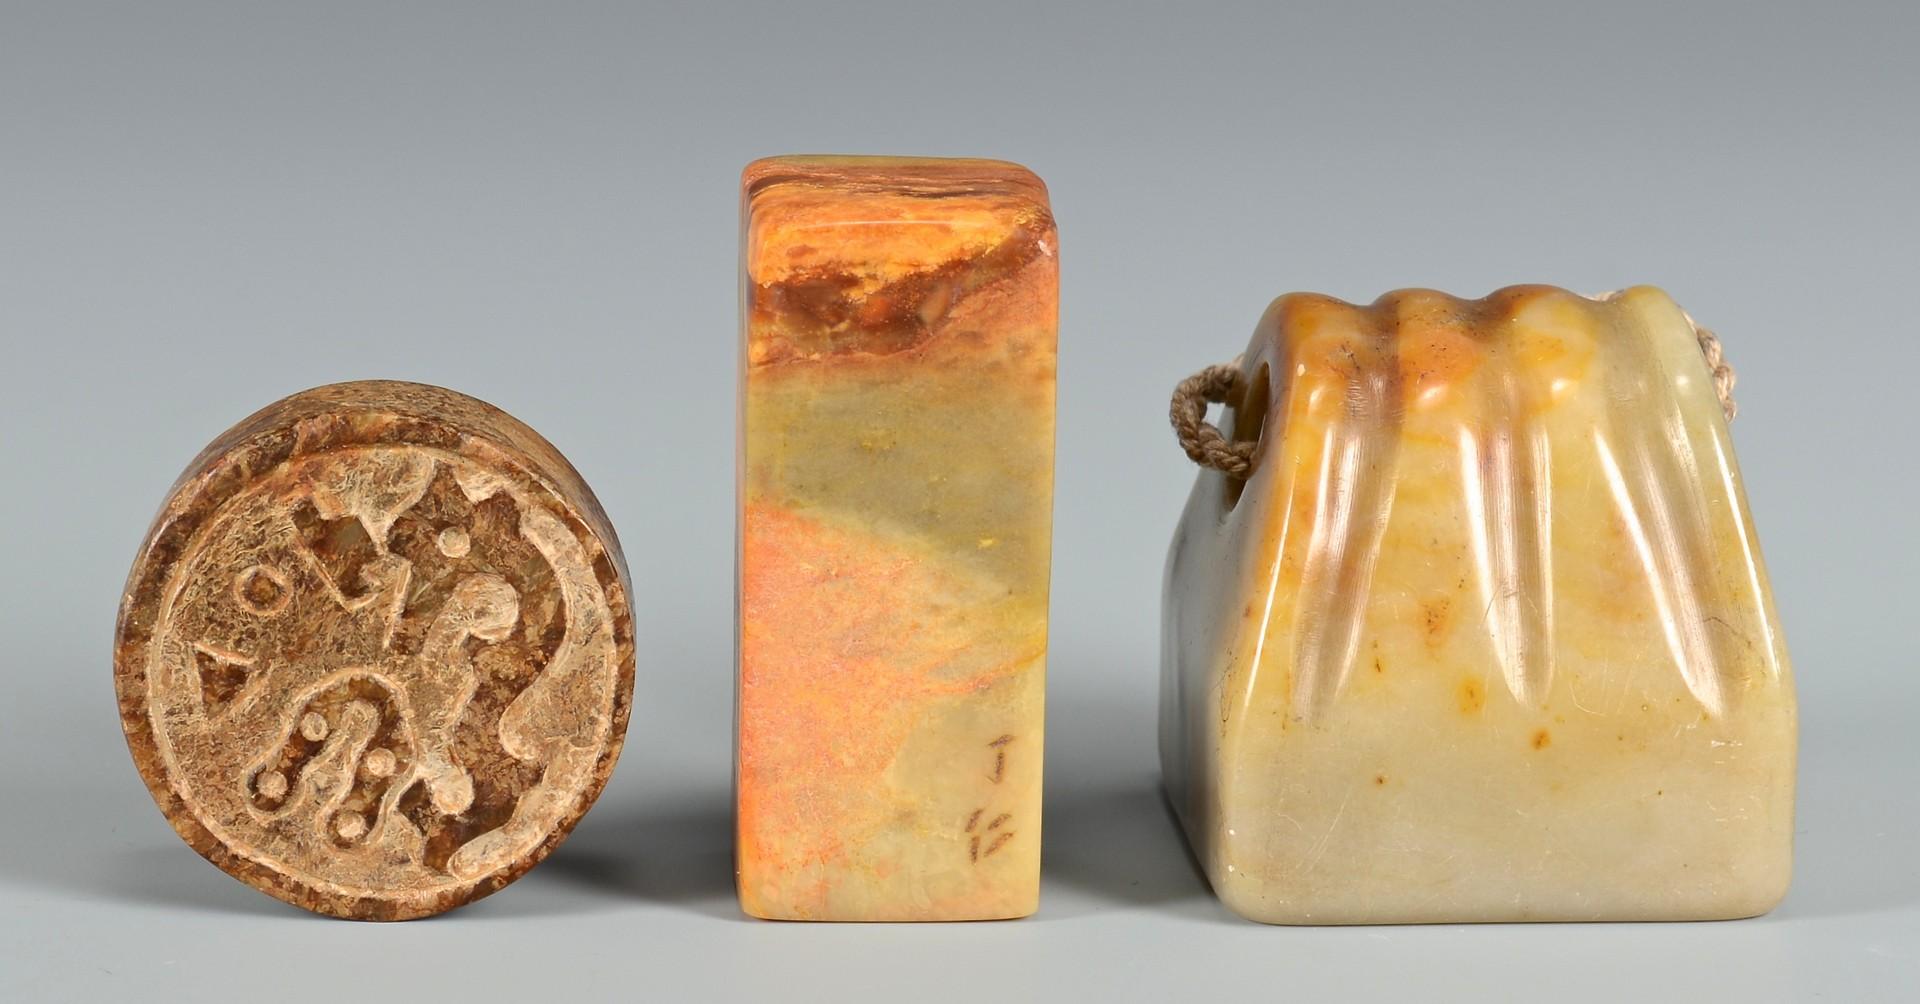 Lot 3832371: 3 Chinese Hardstone Seals